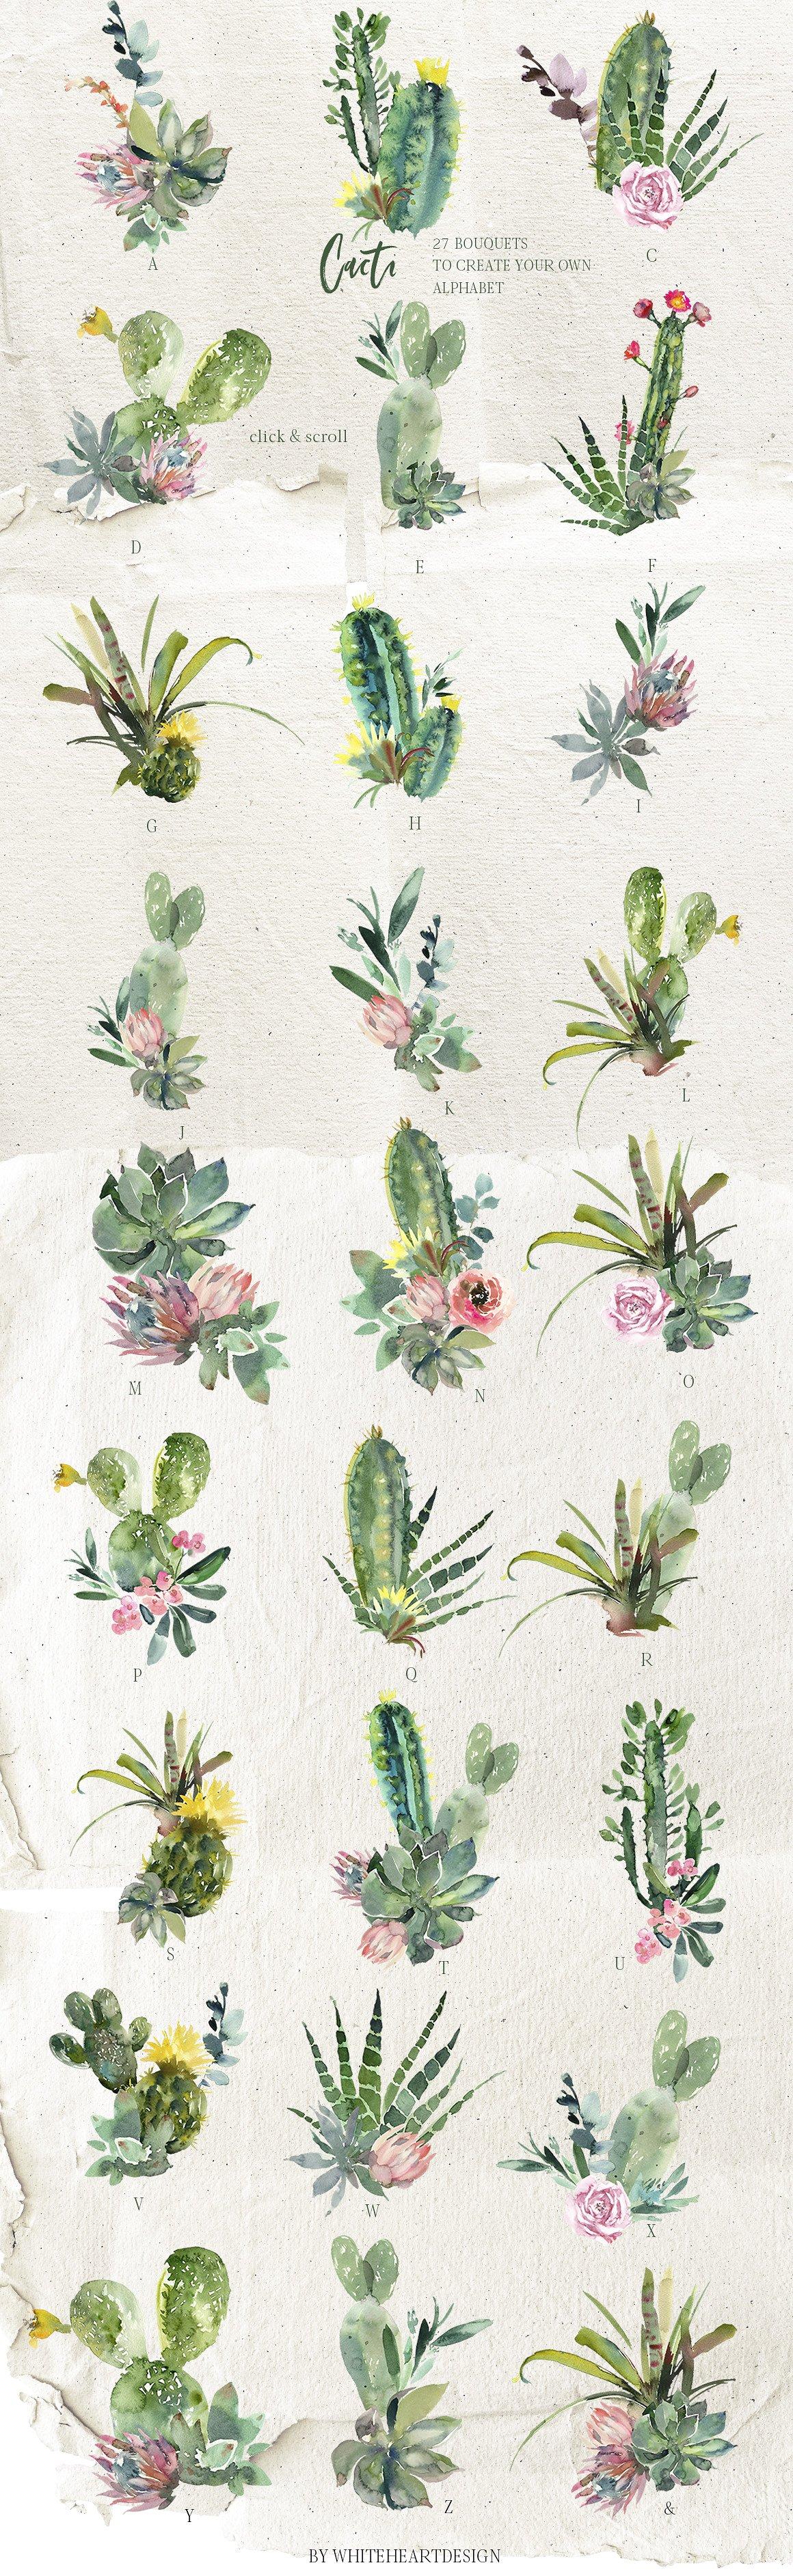 cacti-watercolor-seamless-pattern-.jpg